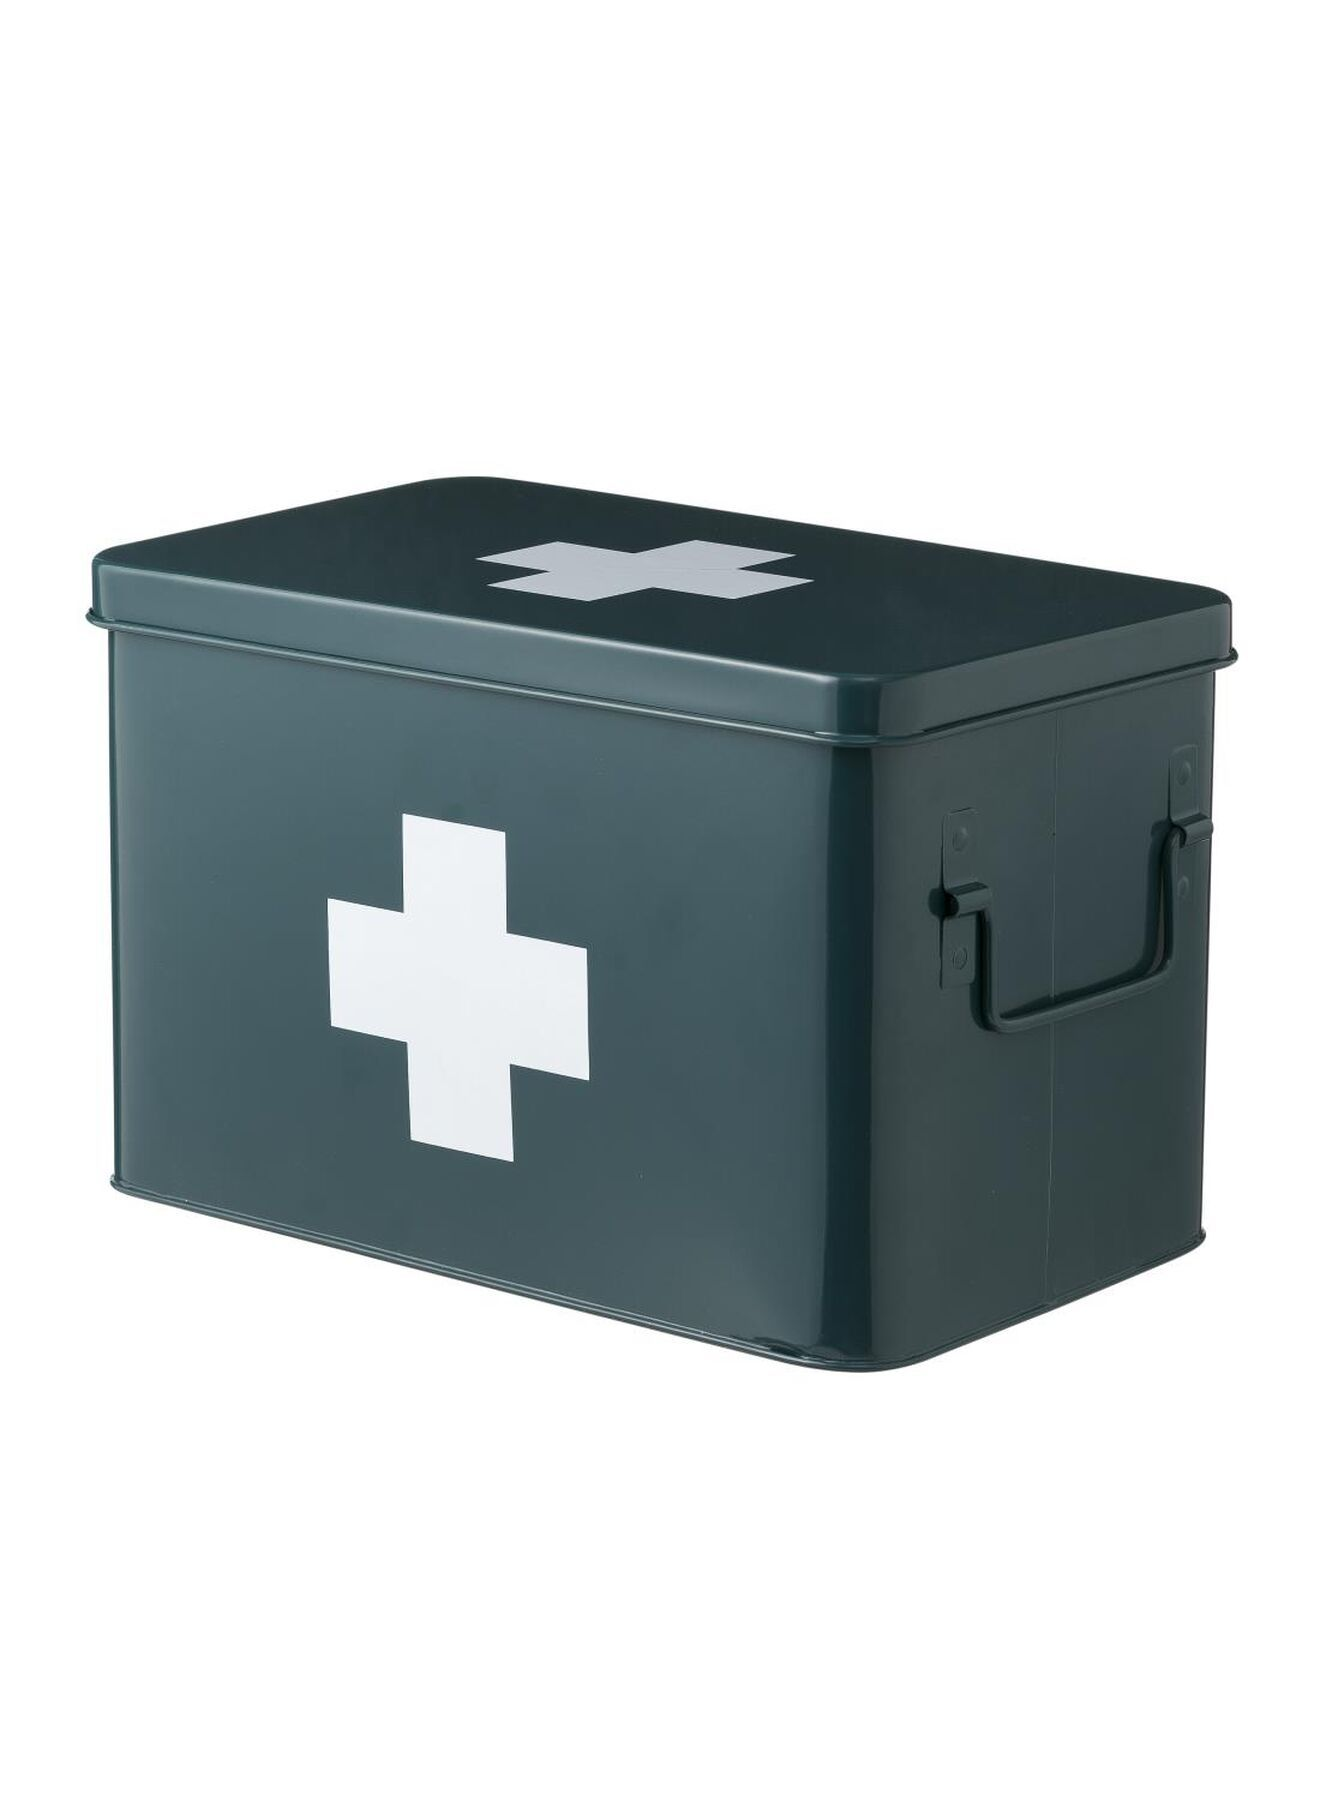 Boite A Pharmacie 19 5 X 32 X 21 Cm En 2020 Boite A Pharmacie Boite A Medicament Et Pharmacie